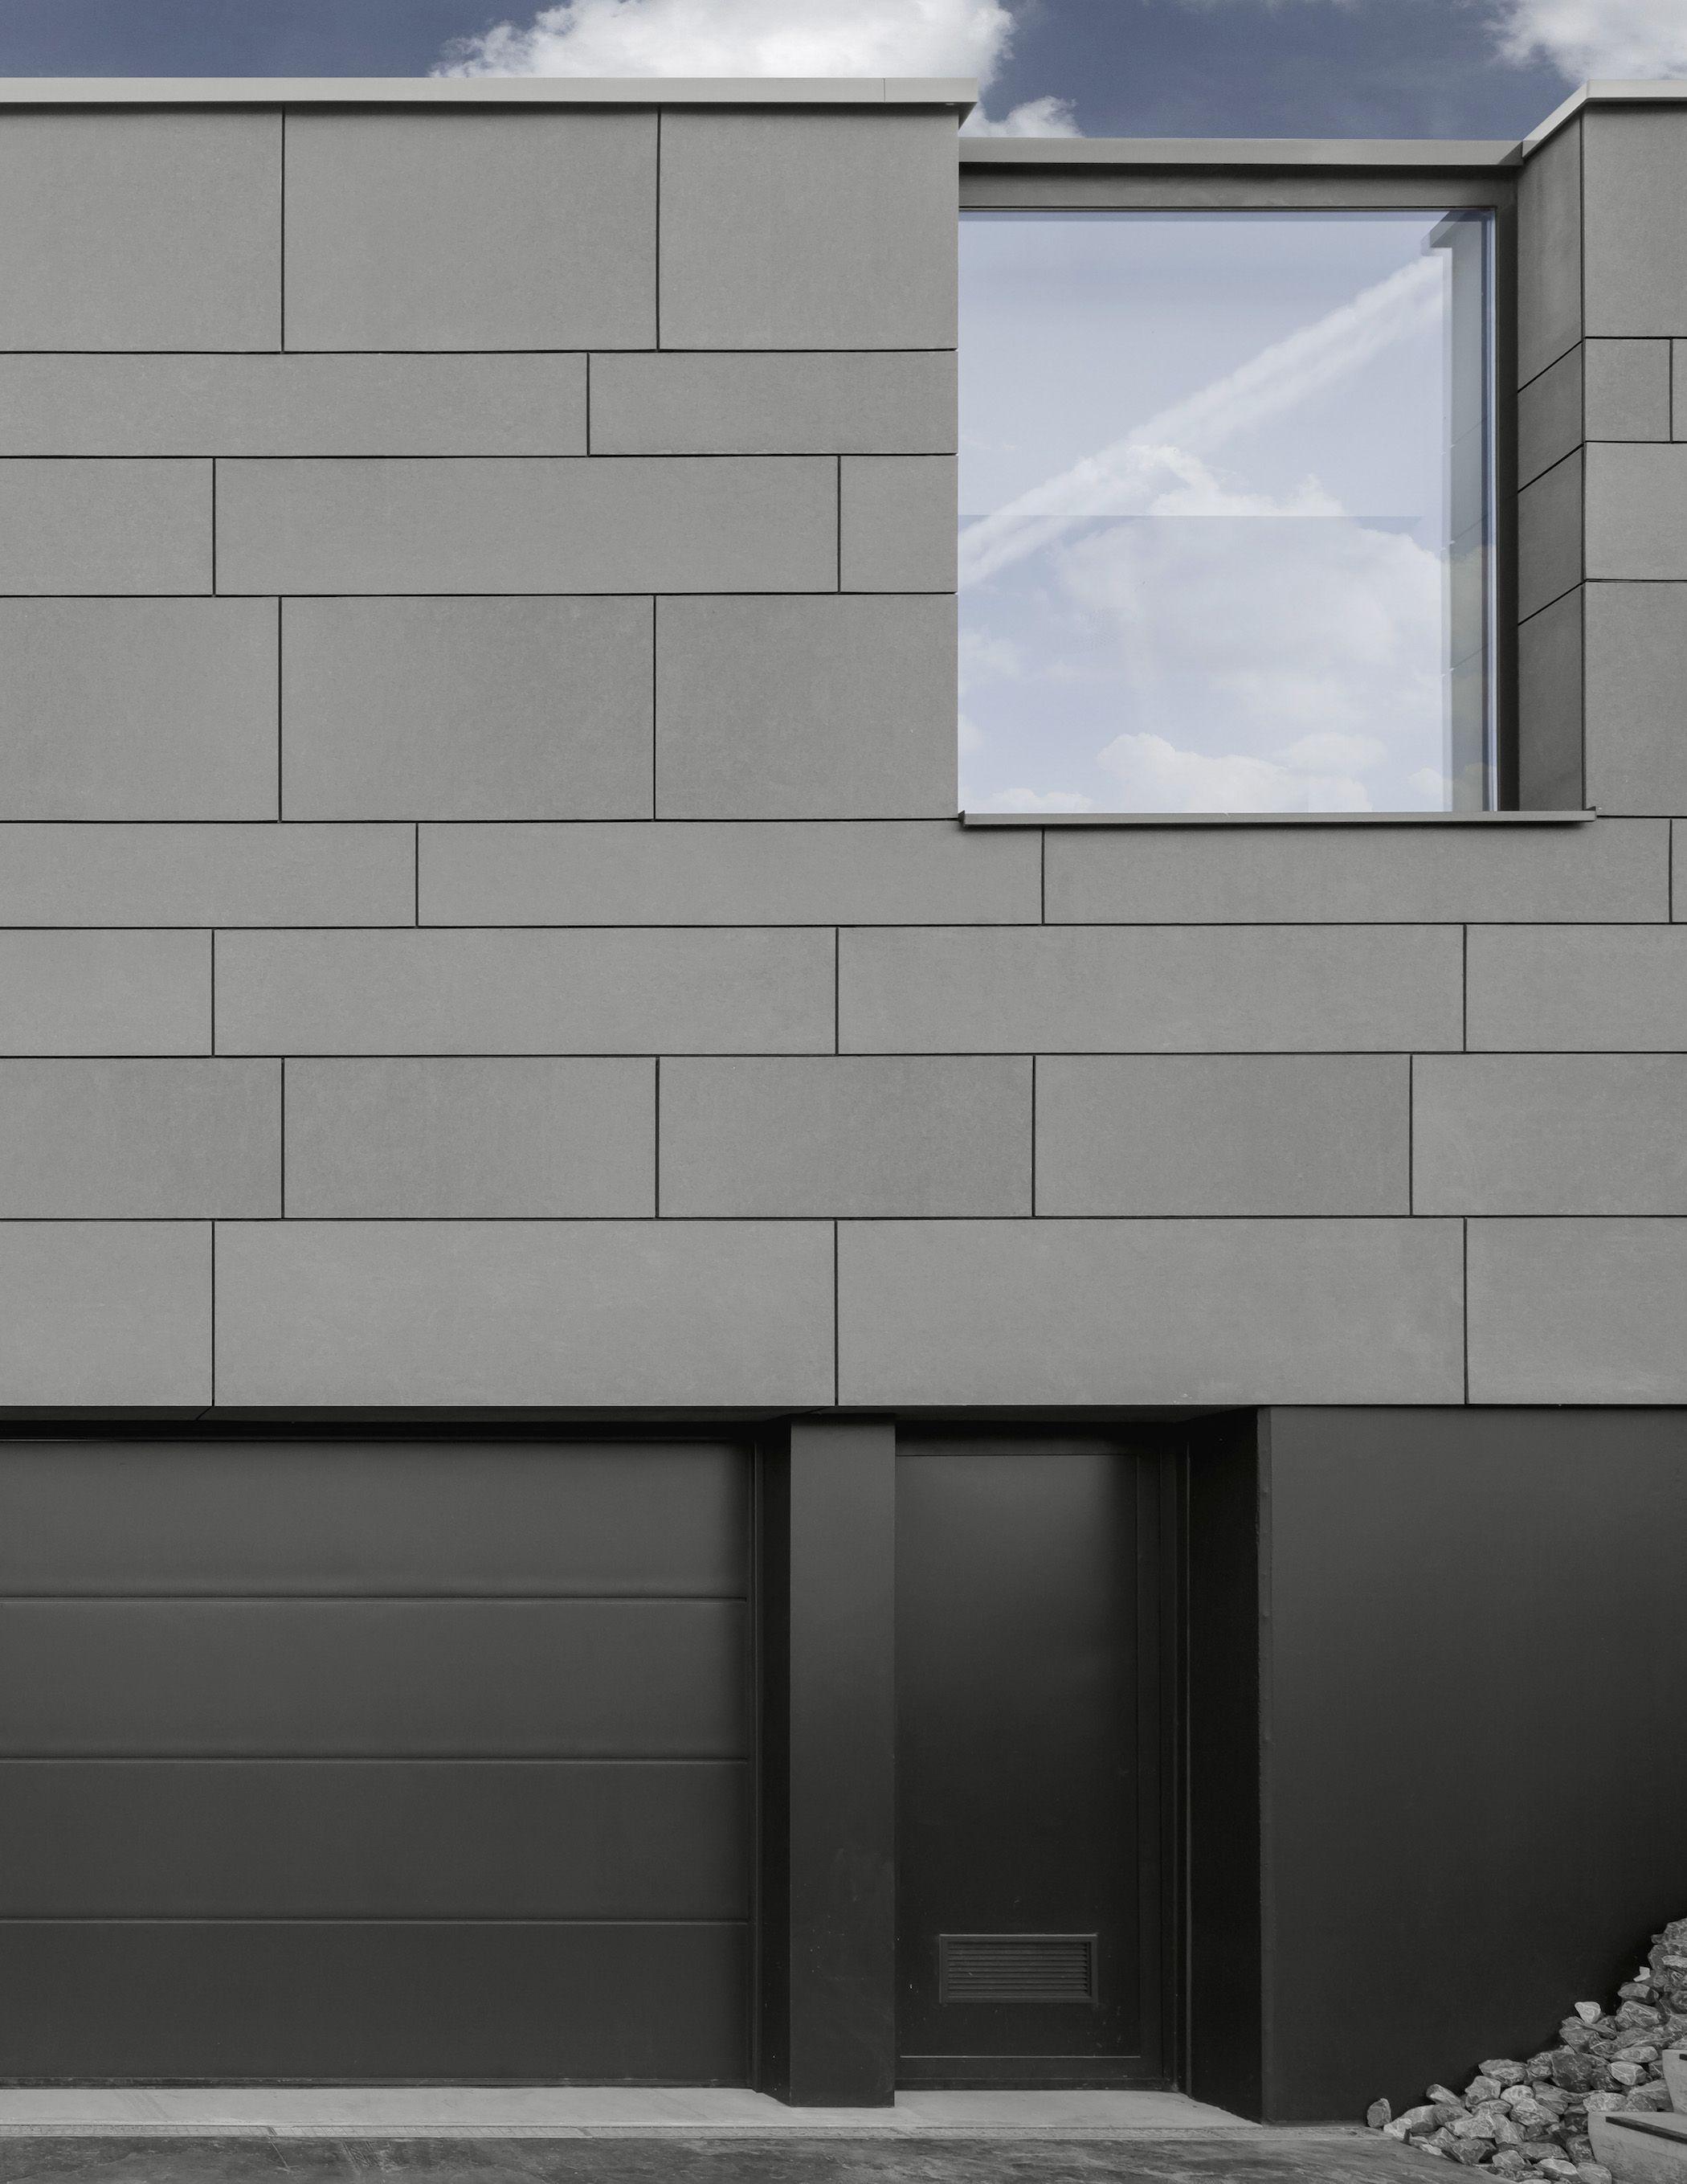 simply 11 delugan meissl aa photographer hertha hurnaus. Black Bedroom Furniture Sets. Home Design Ideas